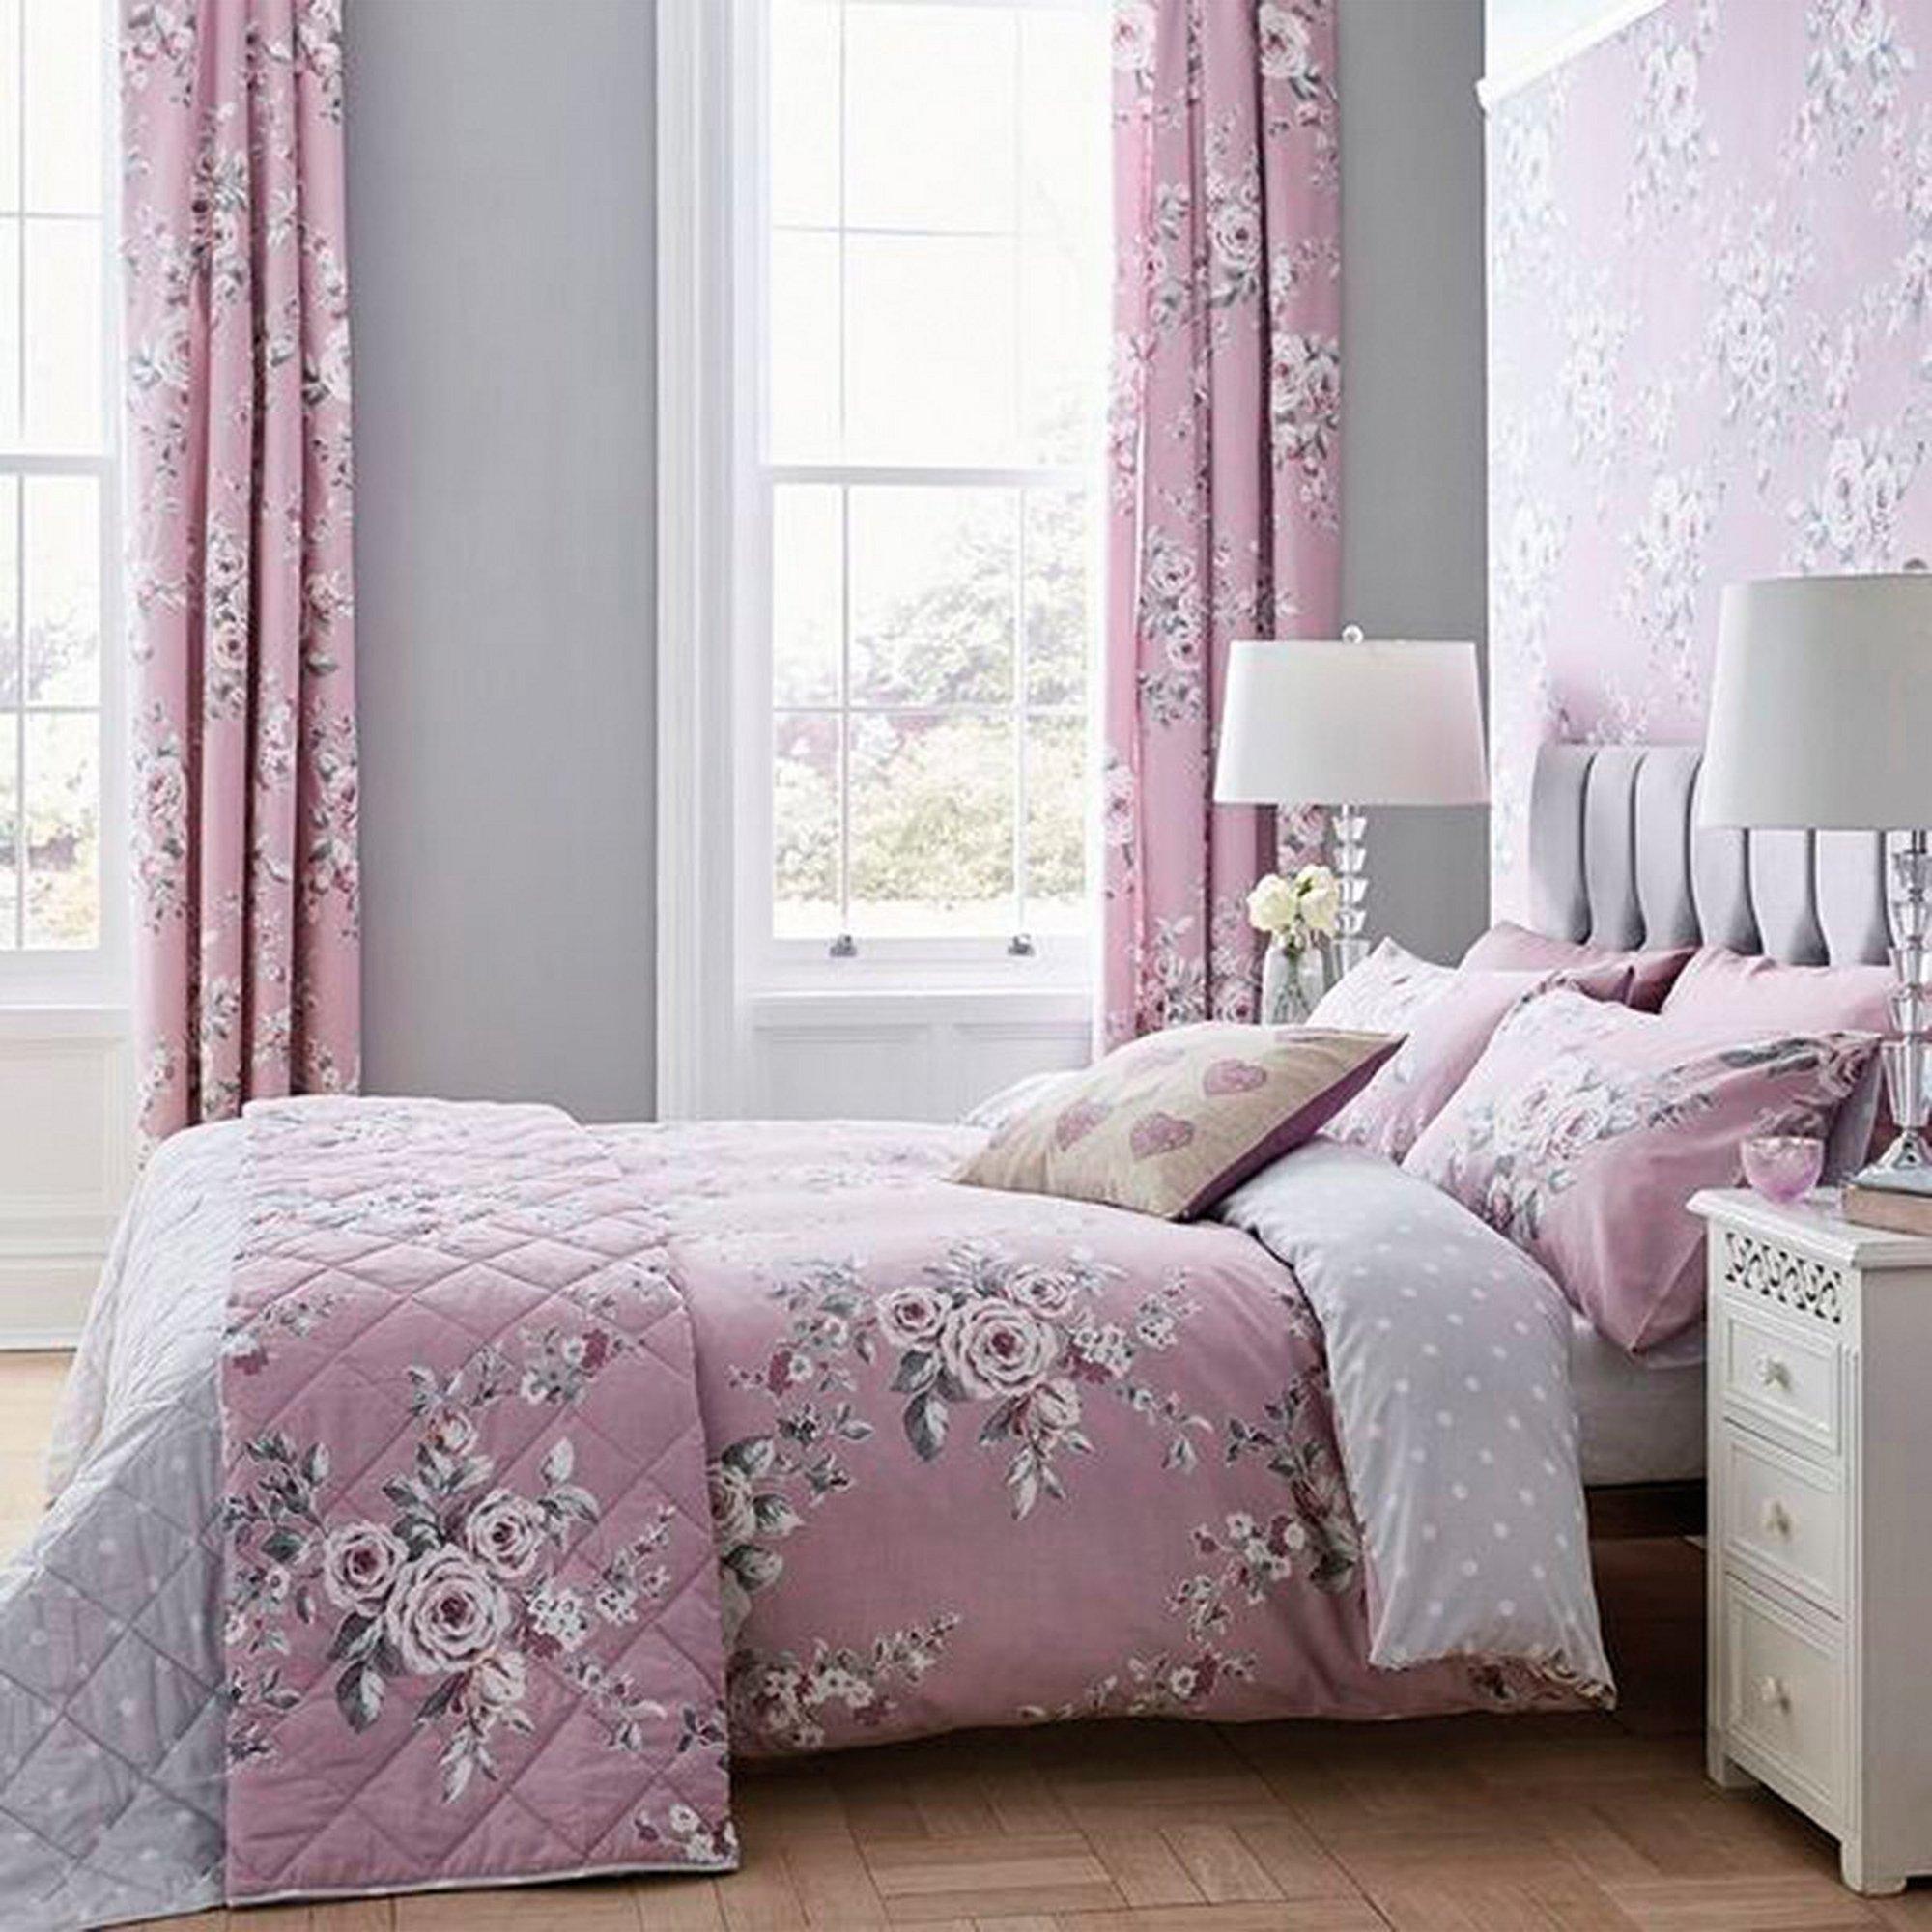 Image of Canterbury Floral and Polka Dot Lined Eyelet Curtains